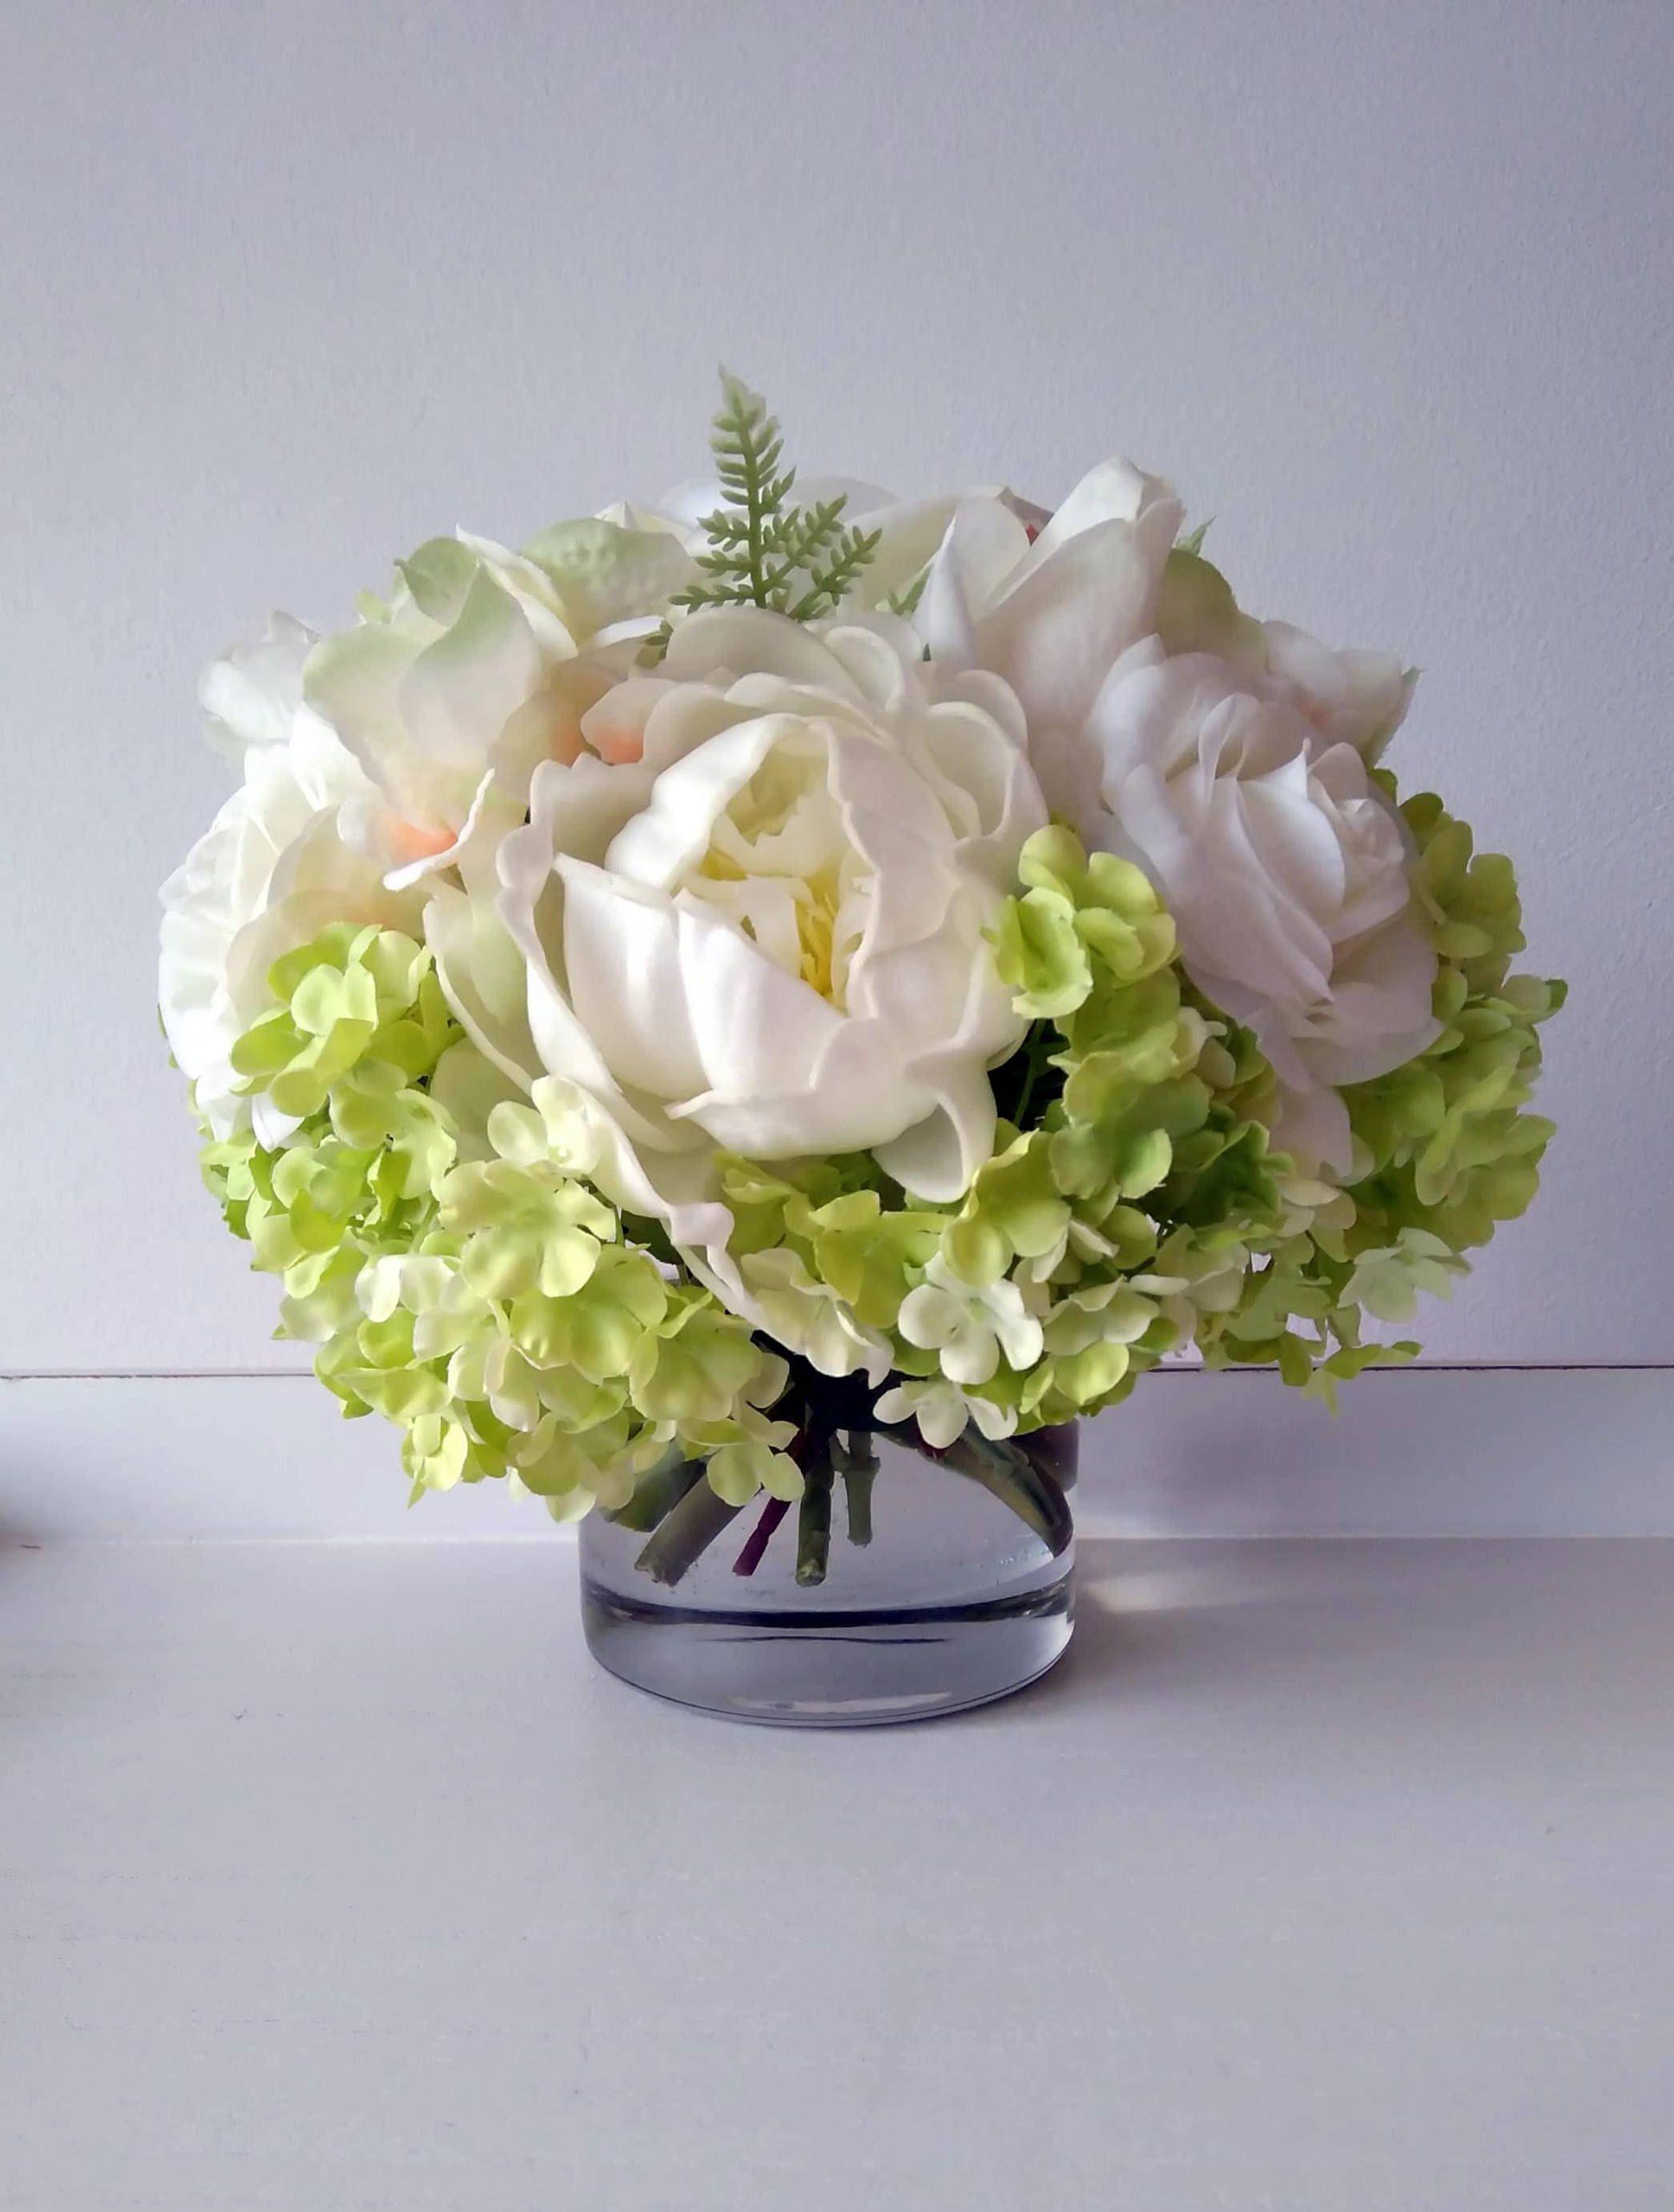 Artificial Flowers Centrepiece Real Touch Floral Arrangement Home